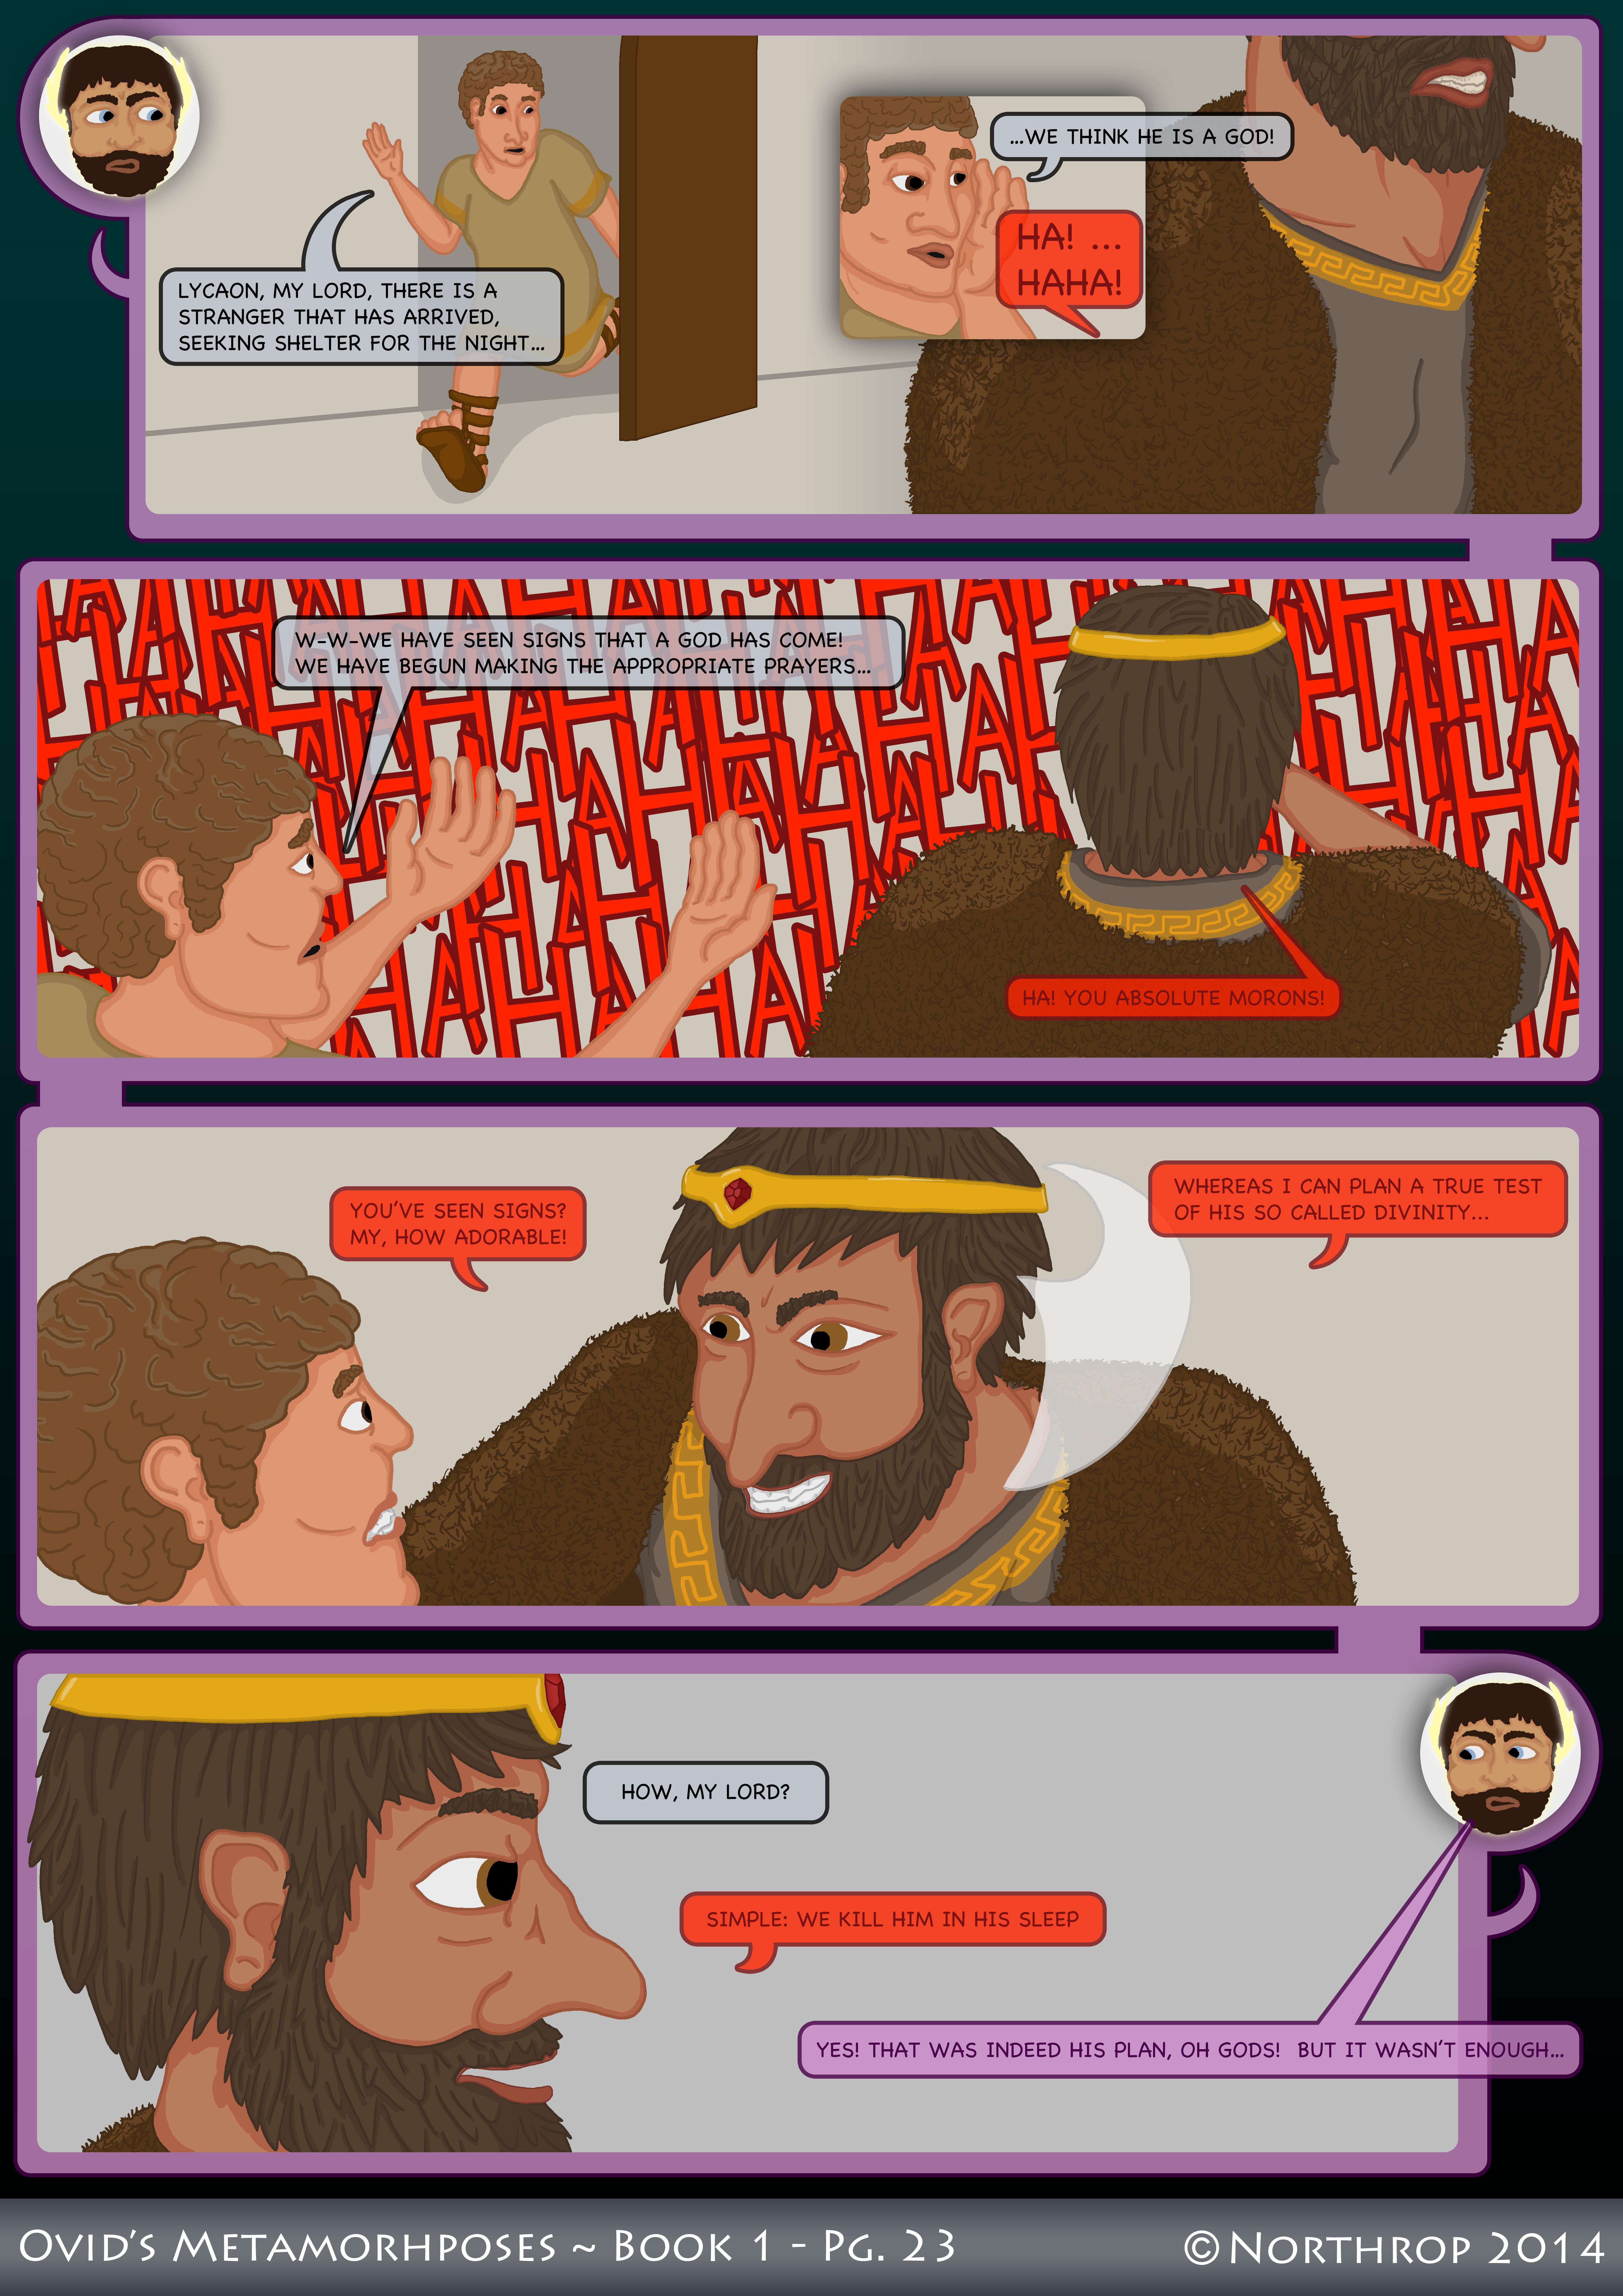 HAHAHAHAHAHAHAHAHAHA.... oh servant, you're so funny!